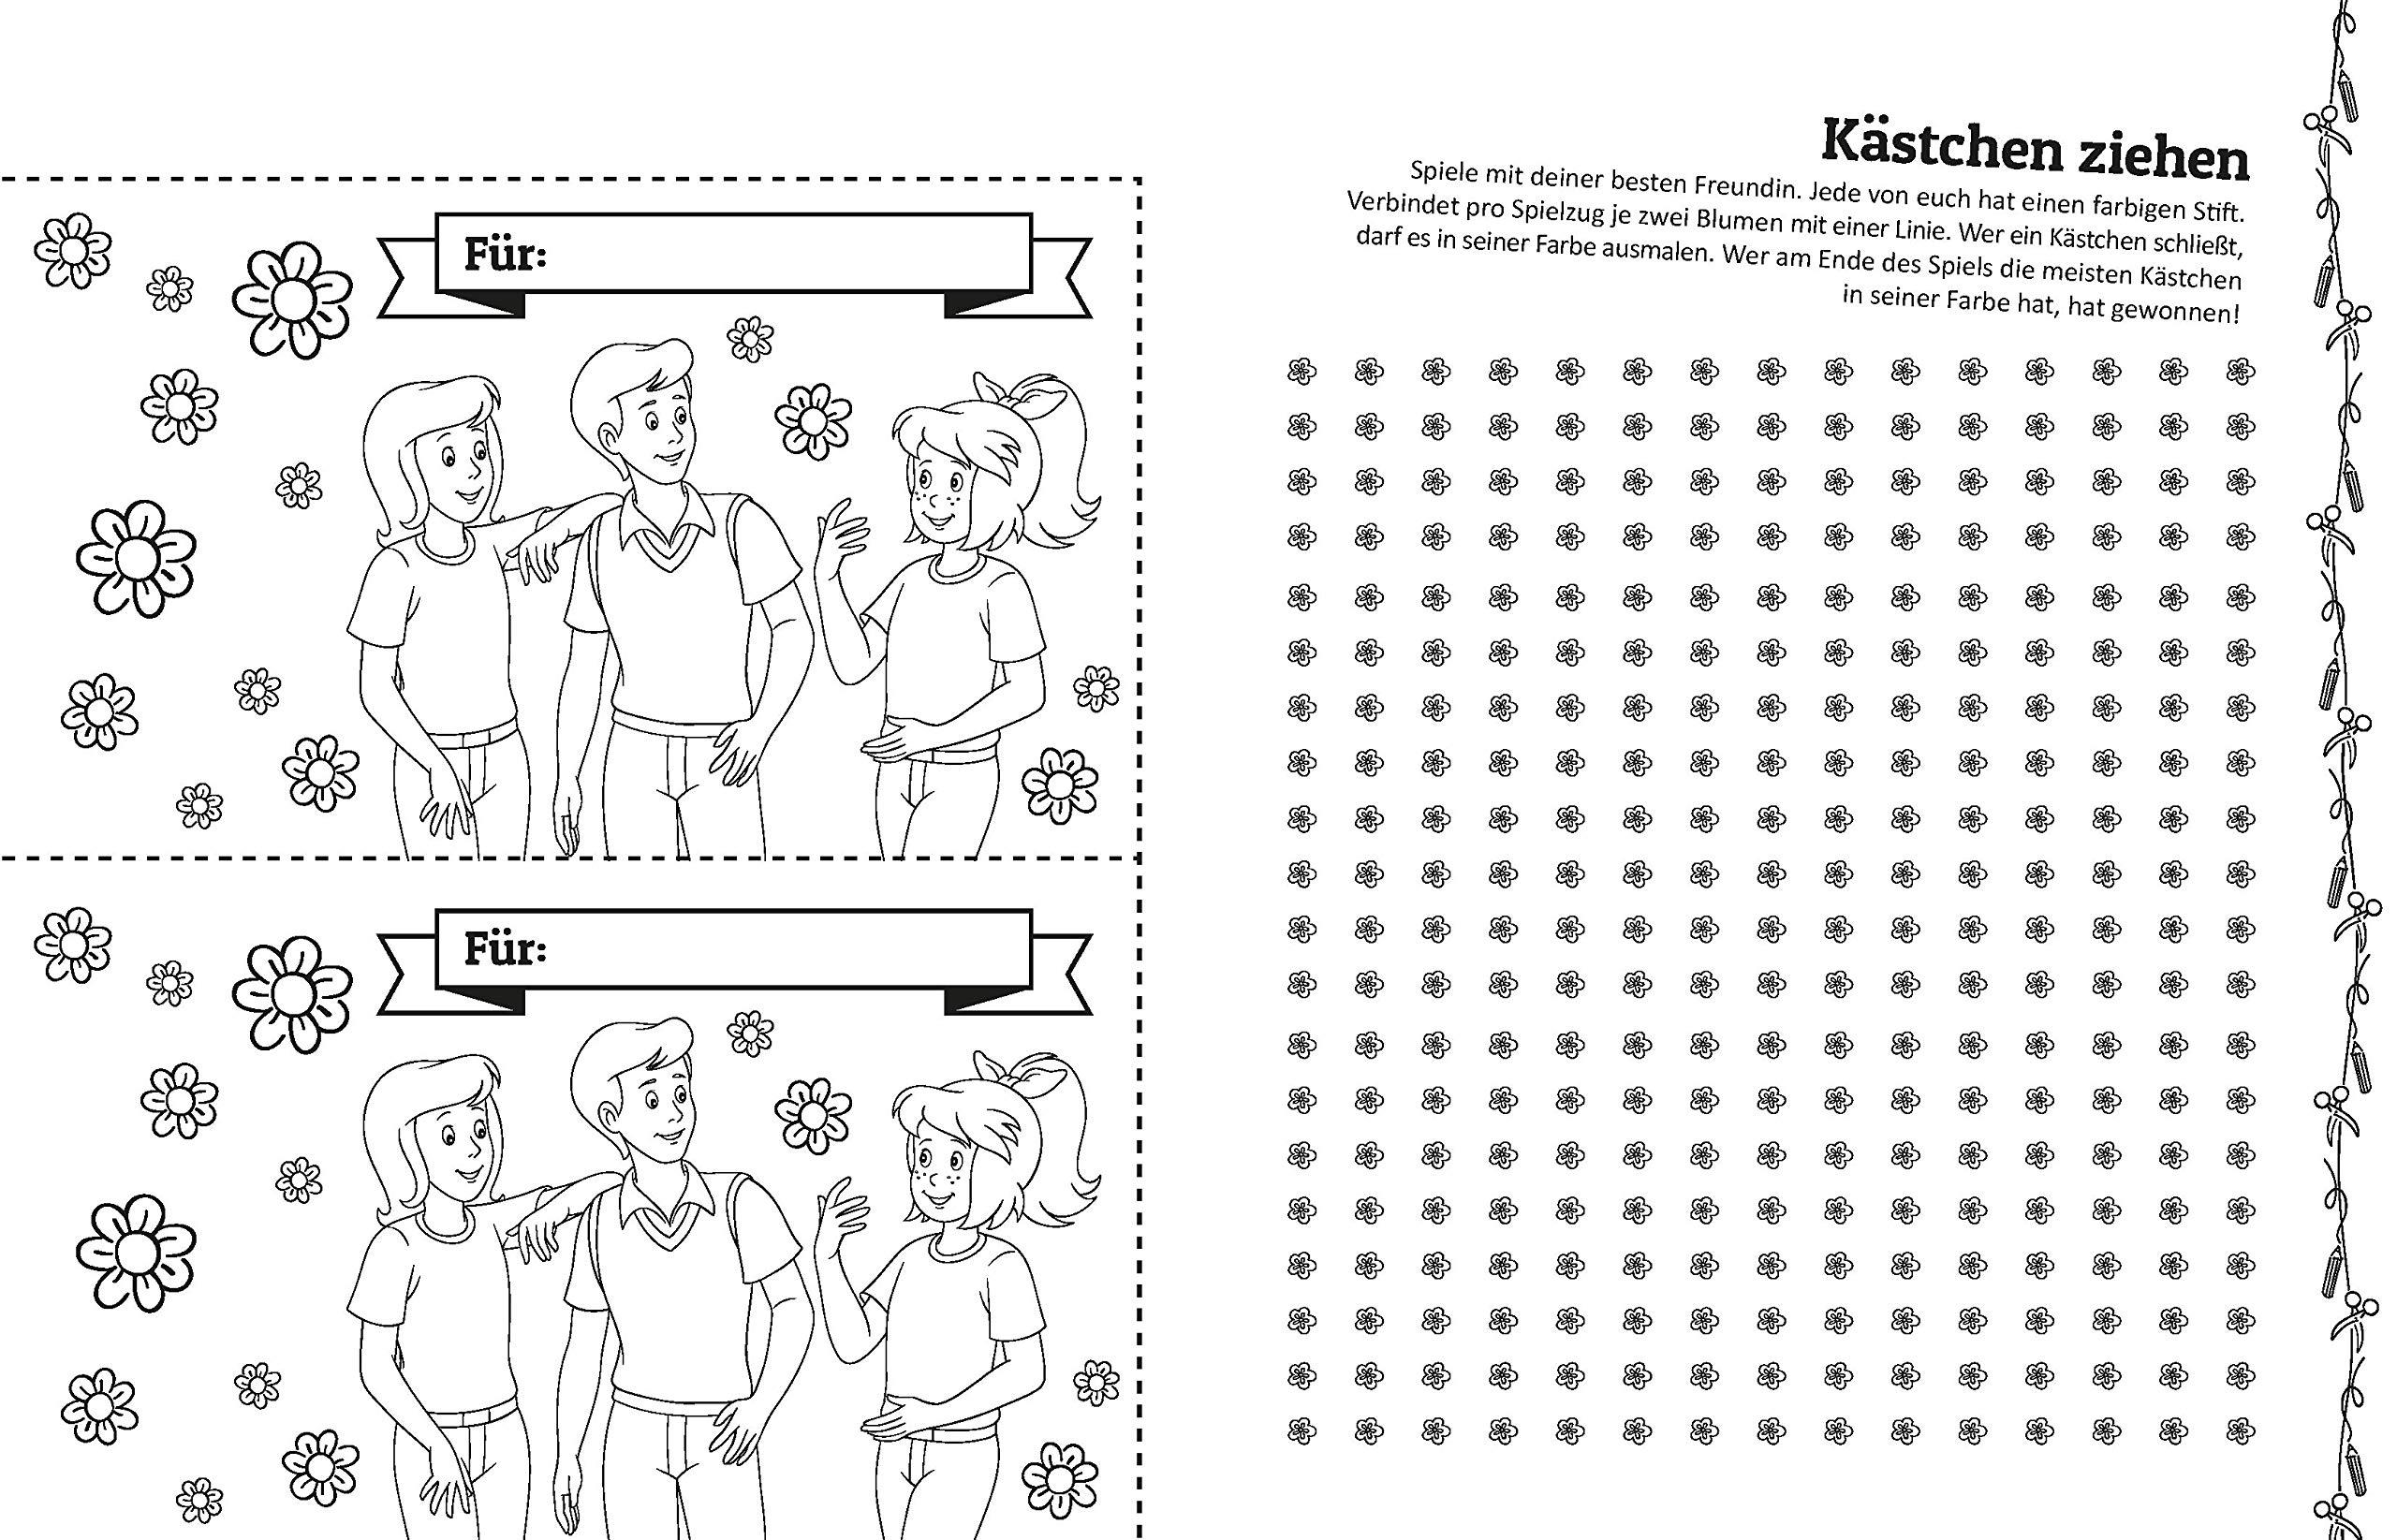 Bibi Tina Ratseln Stickern Basteln Mit Vielen Tollen Ideen Fur Pferde Freundinnen Amazon De Bucher